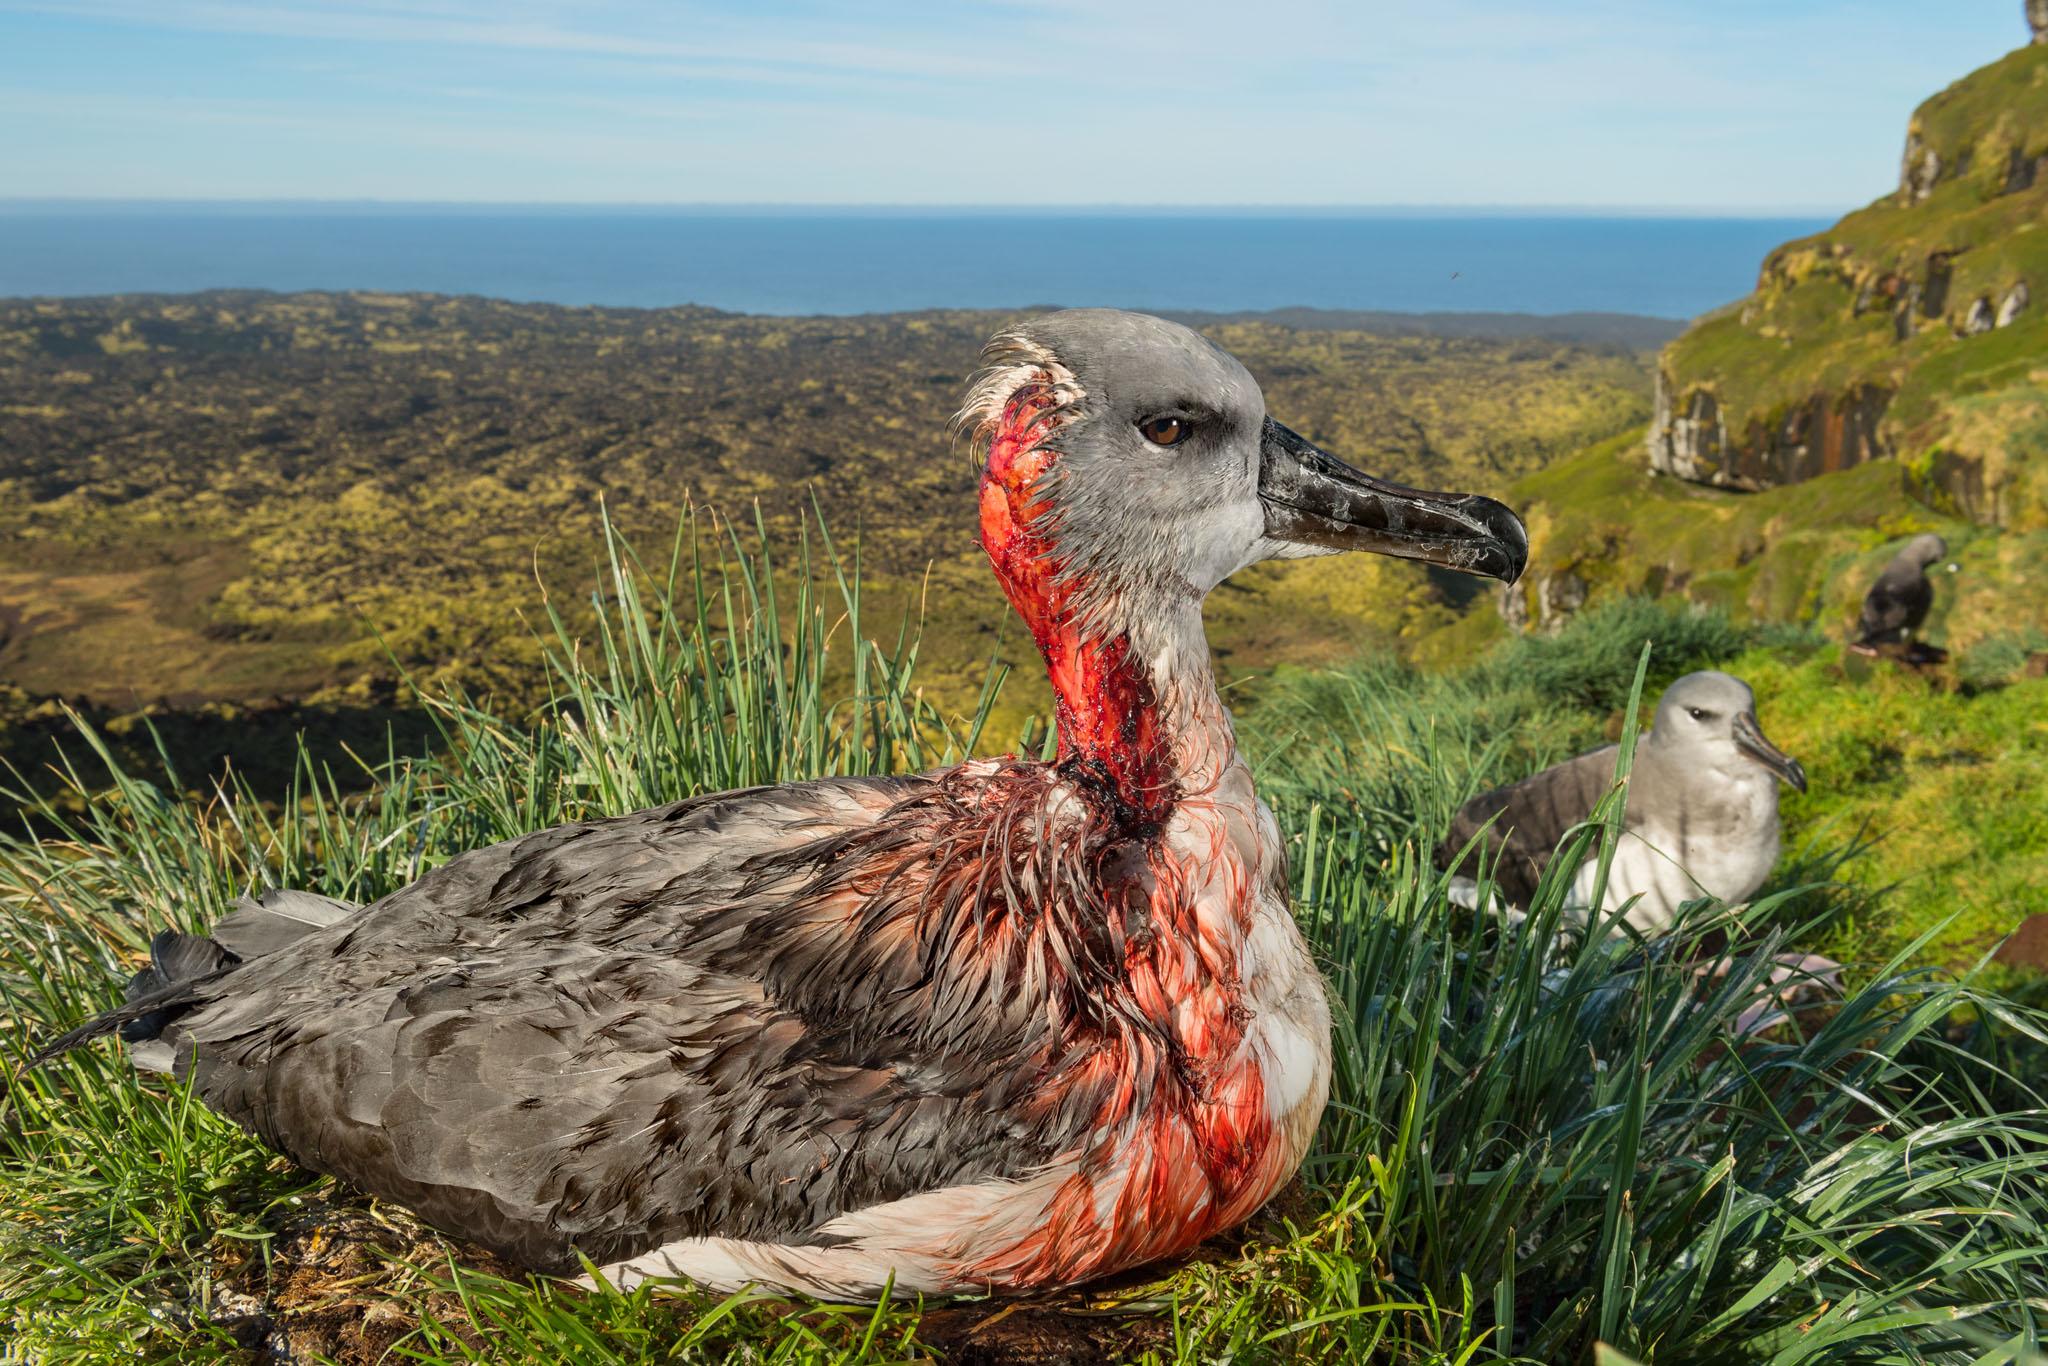 zombie-mouse-seabirds-marion-island-thomas-peschak-2.jpg